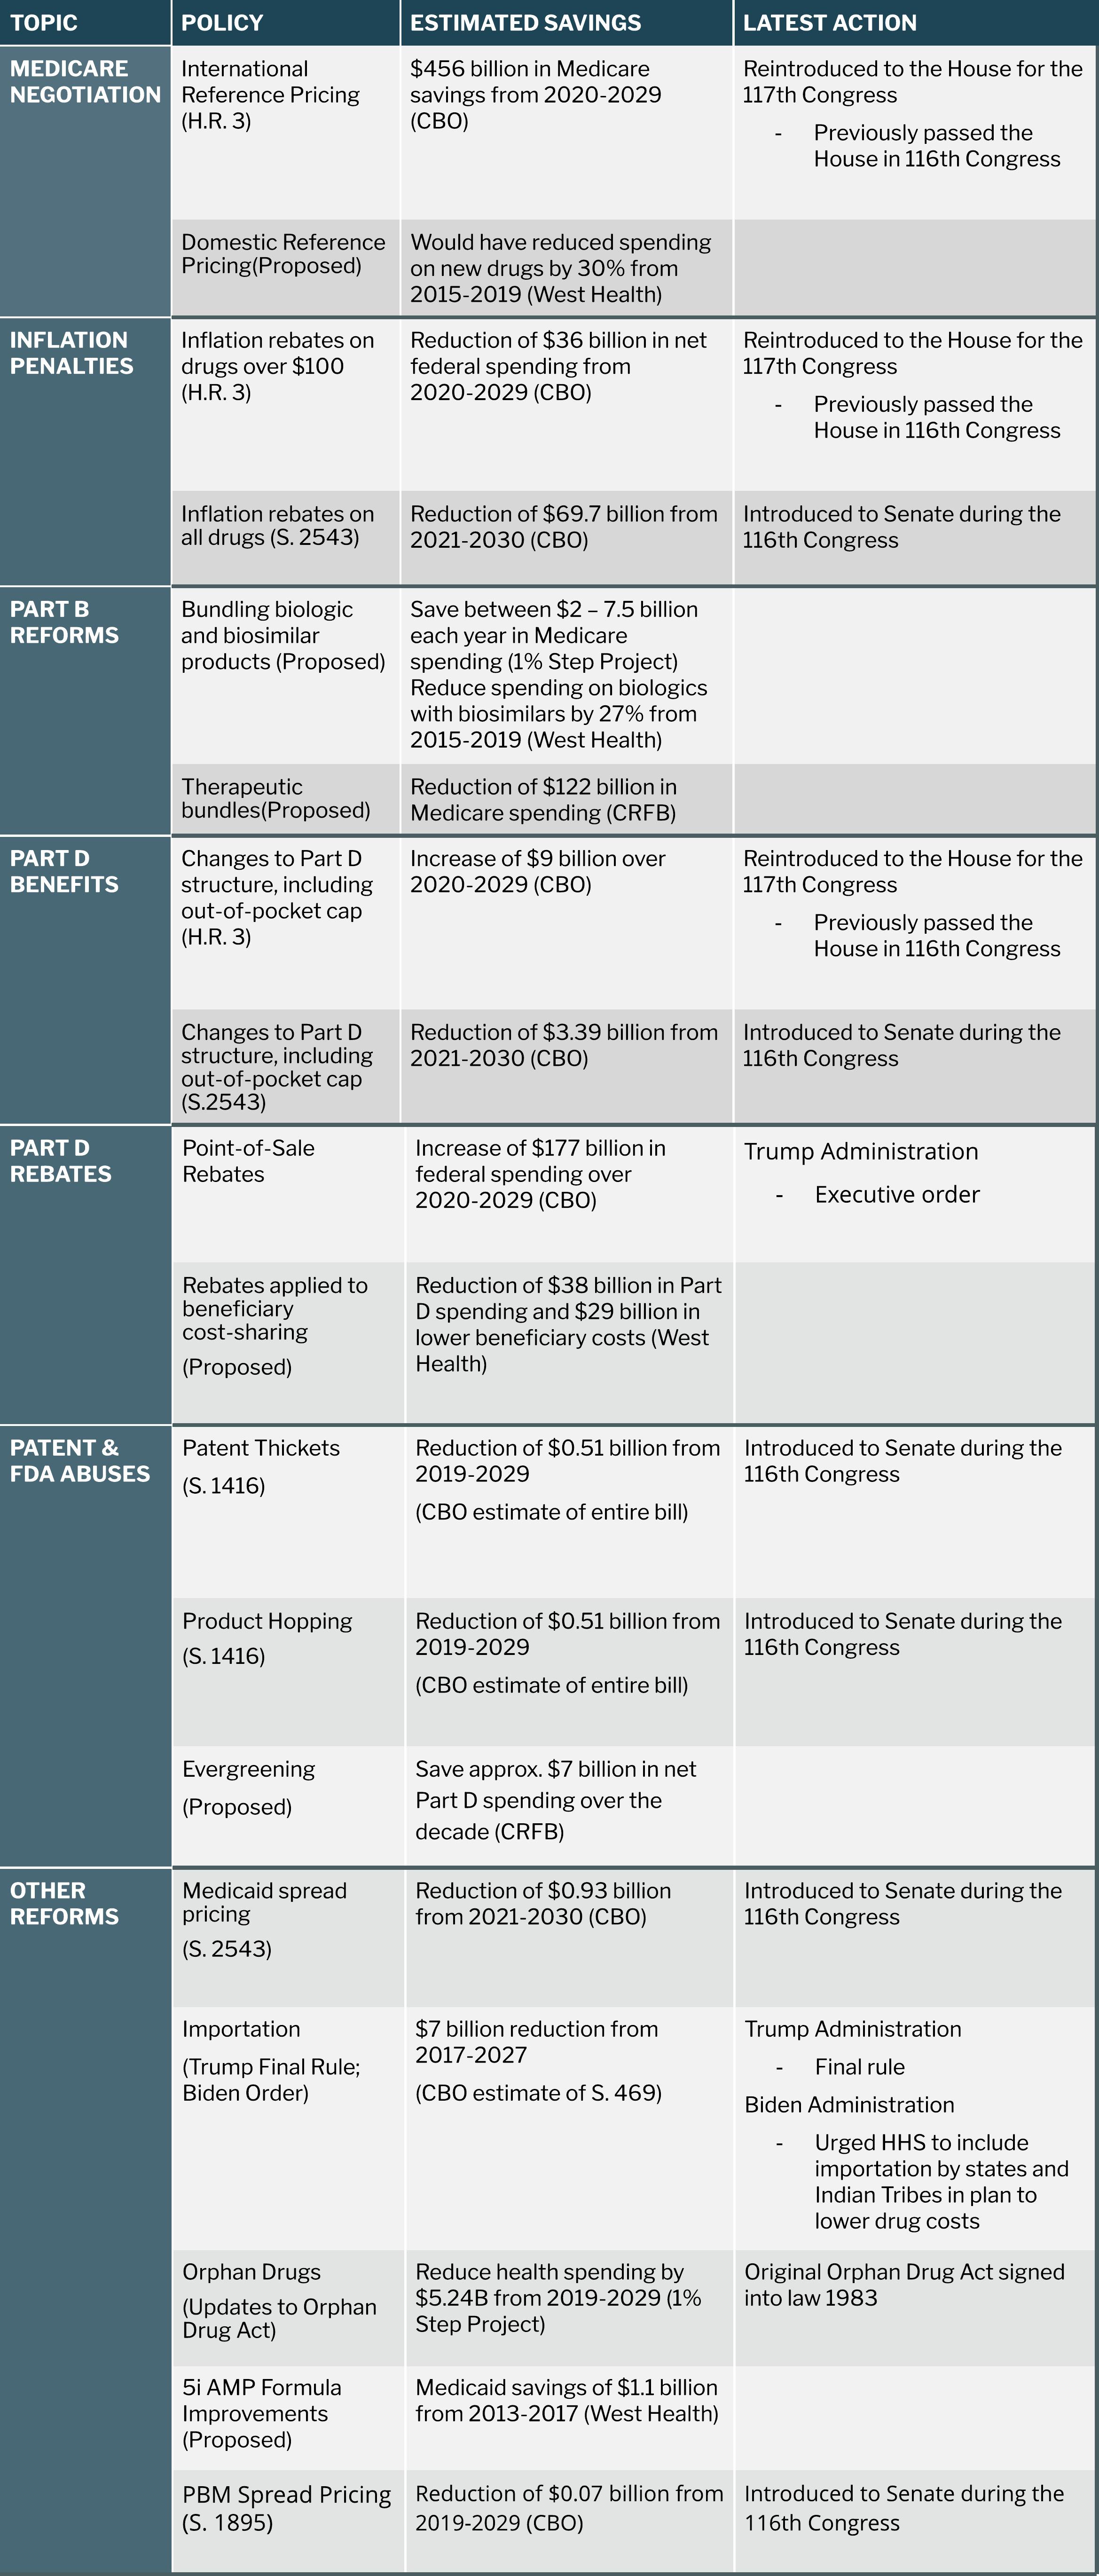 Drug Pricing Policy Savers Playbook